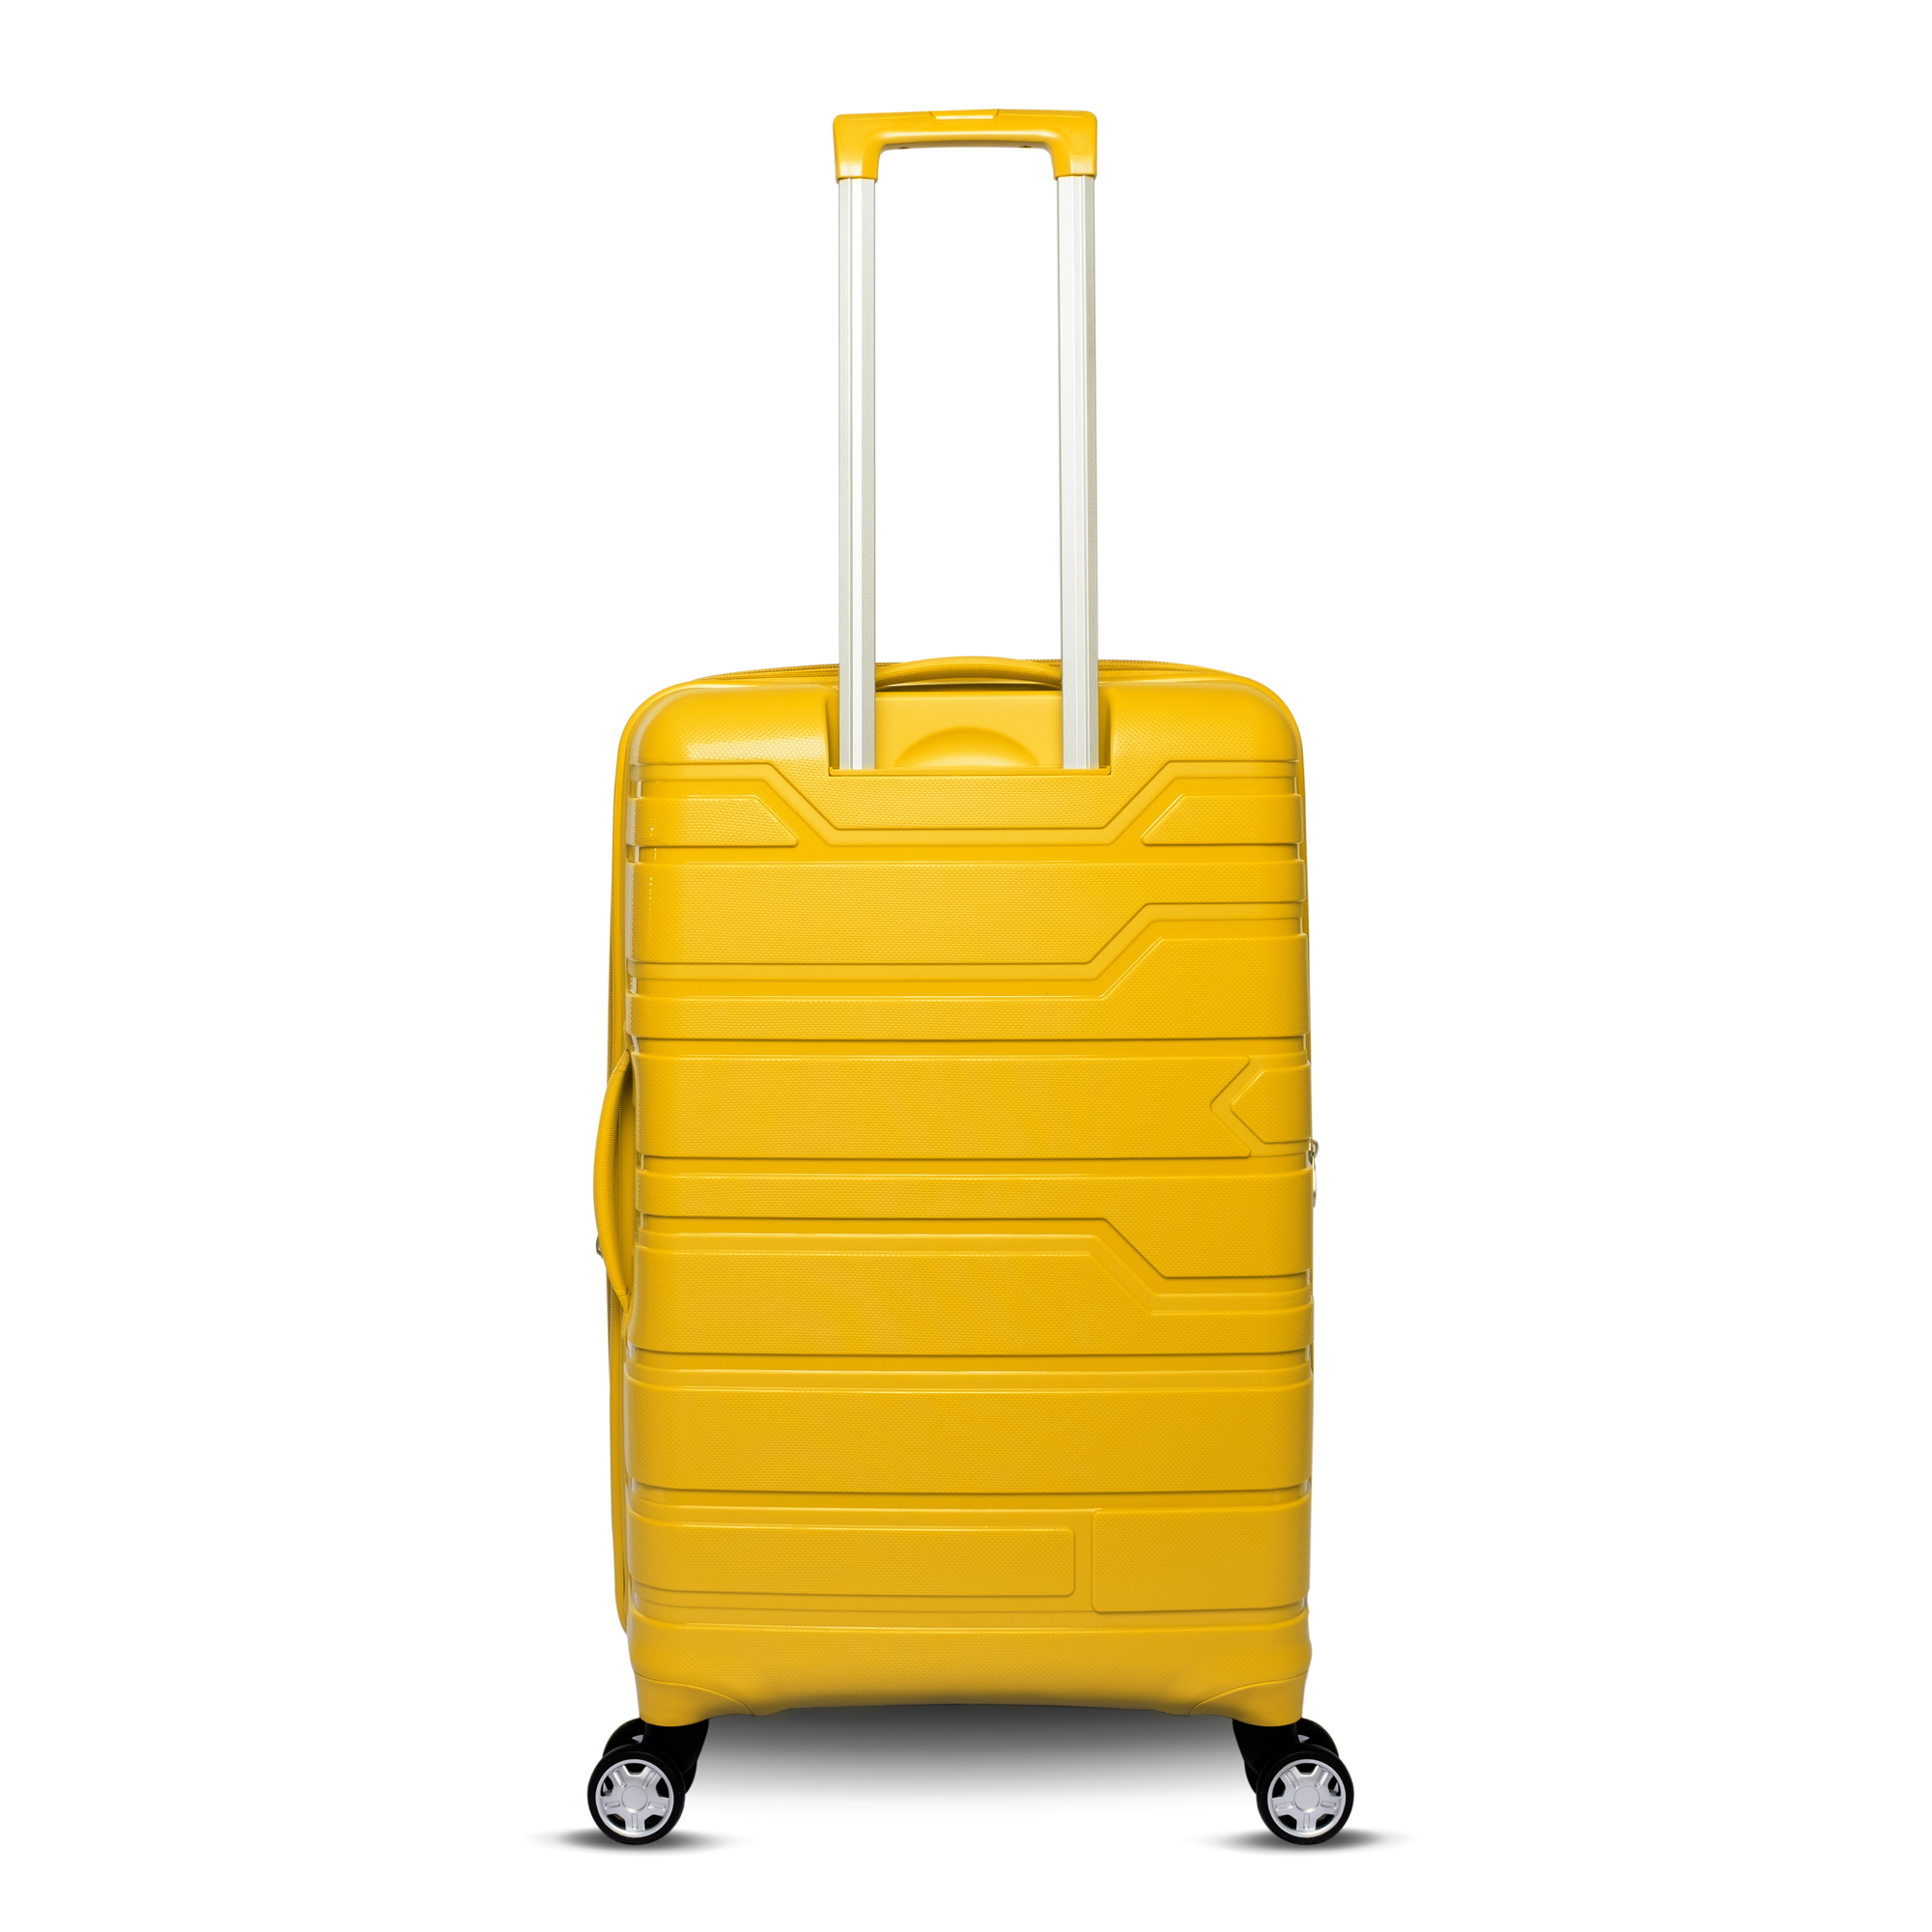 GA1140-back-yellow-2k